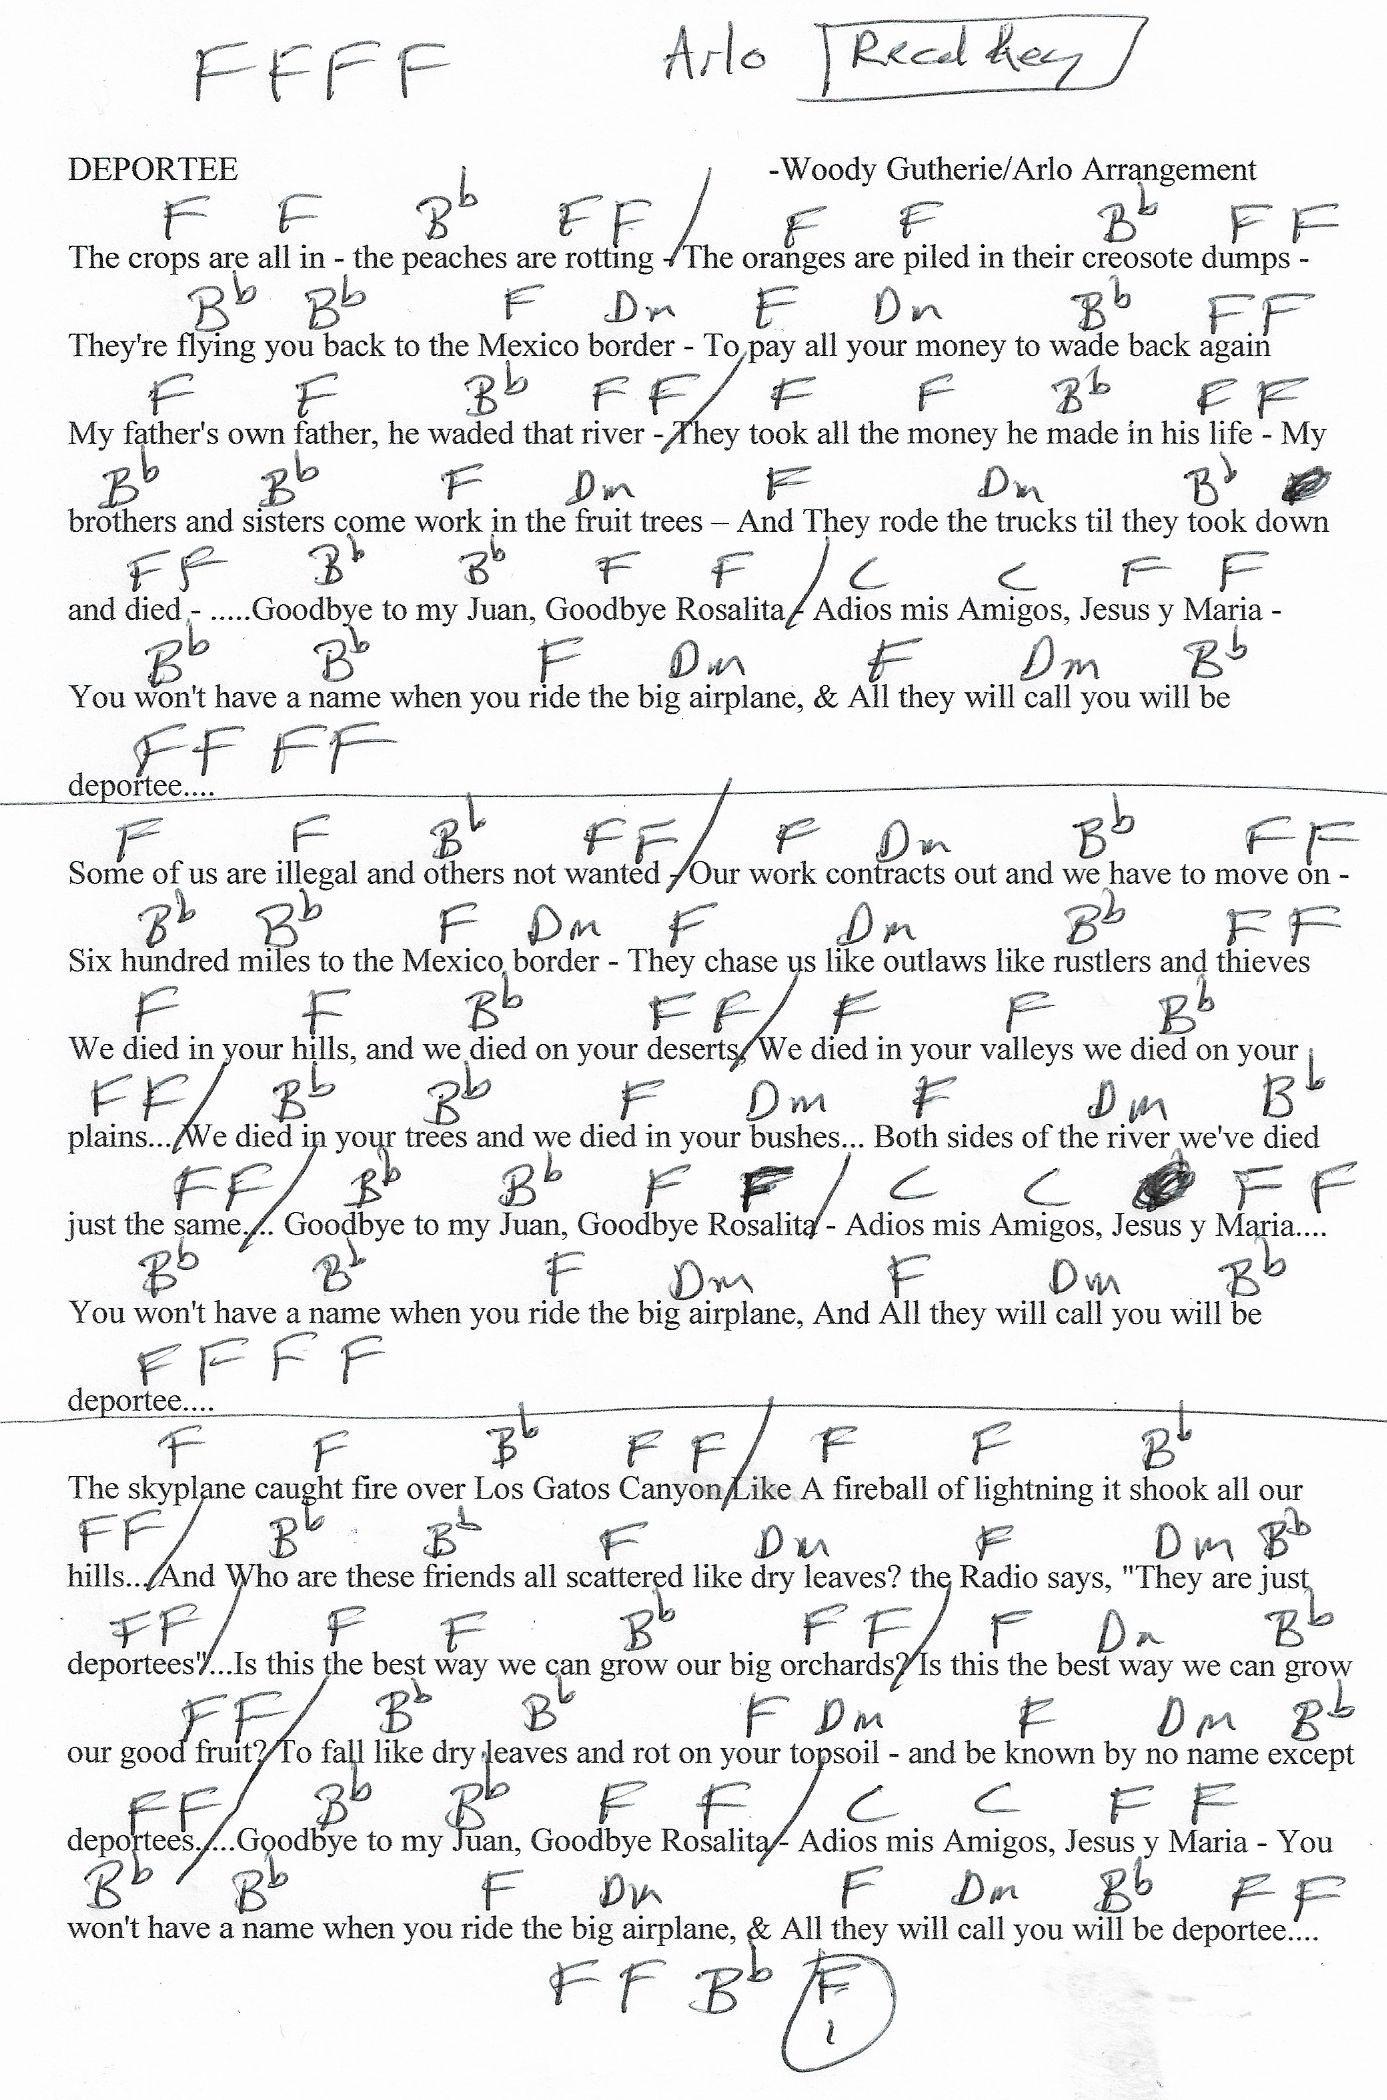 Deportee woody guthriearlo arrangement guitar chord